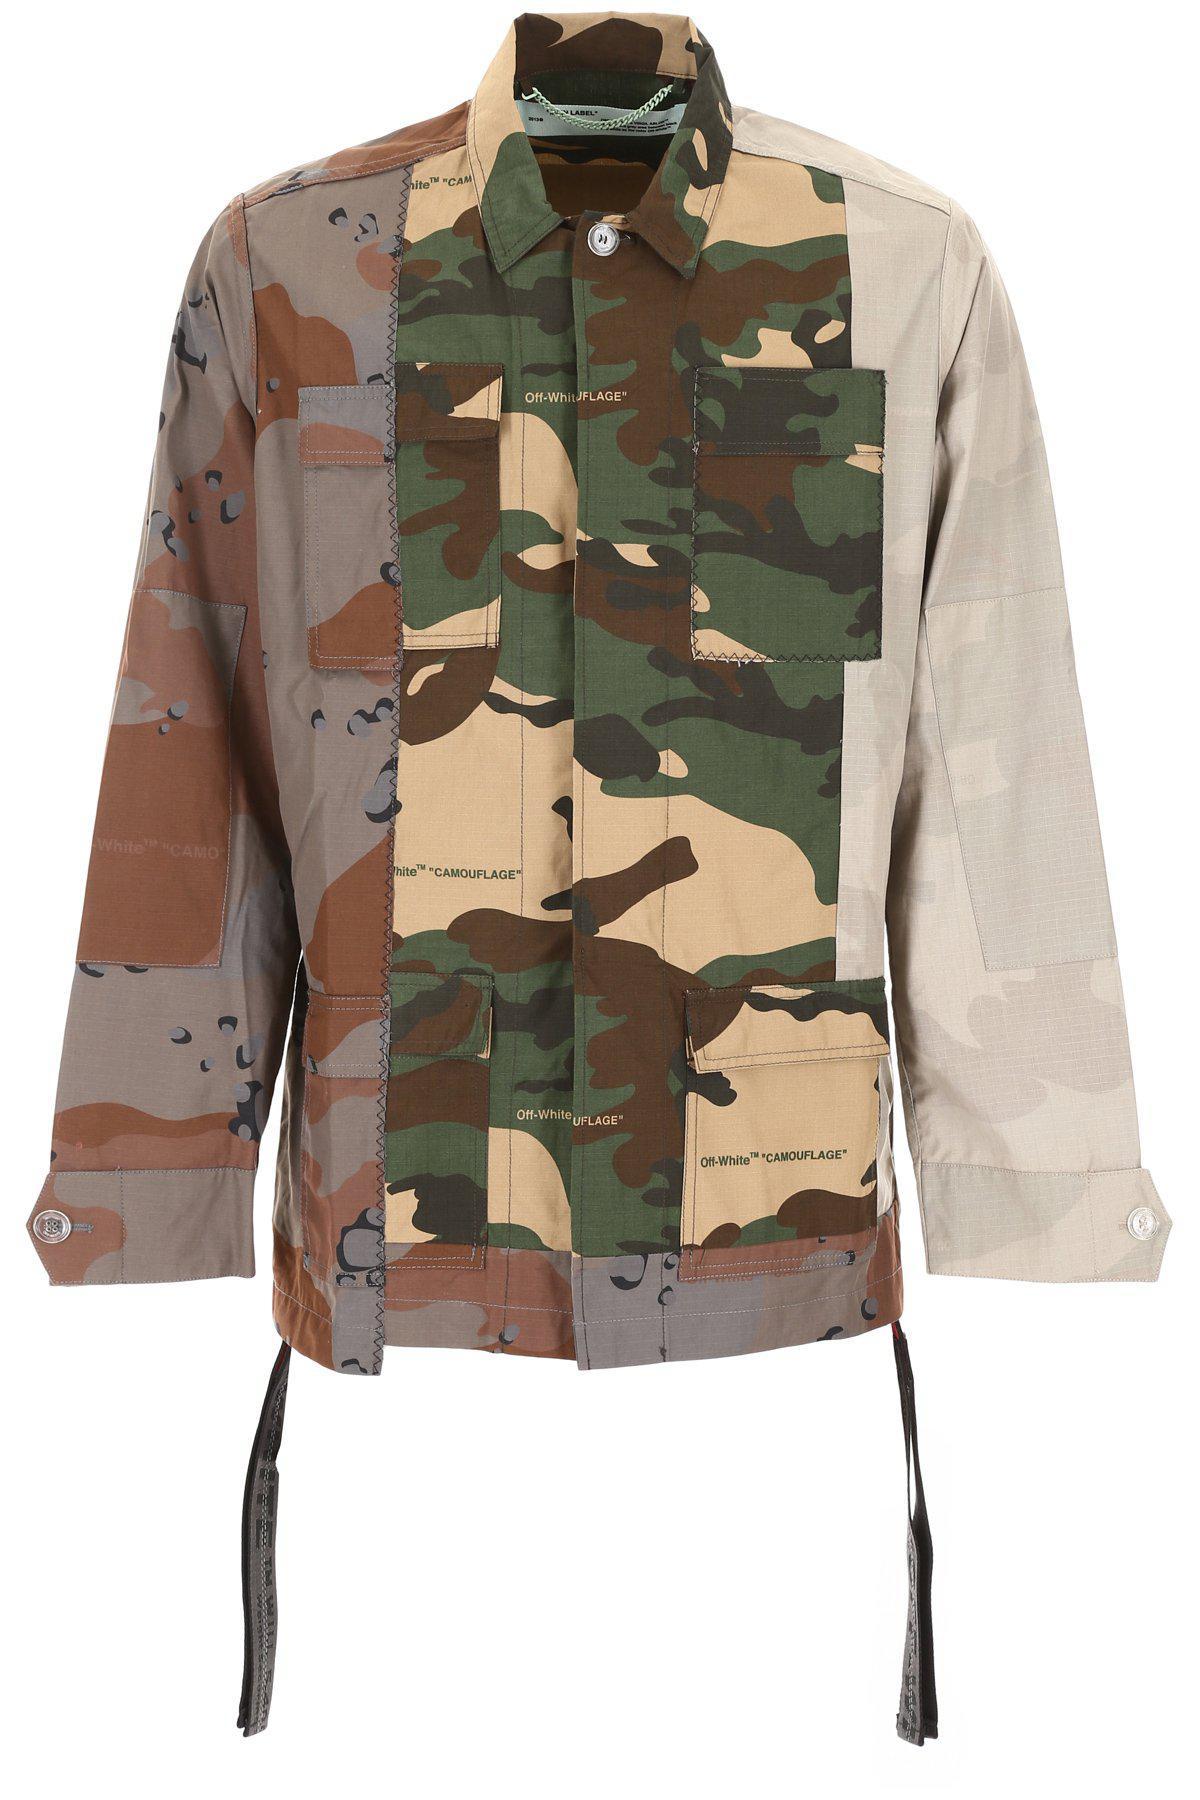 f95dd3c6237ac Off-White c/o Virgil Abloh. Men's Green Arrows Print Camouflage Jacket